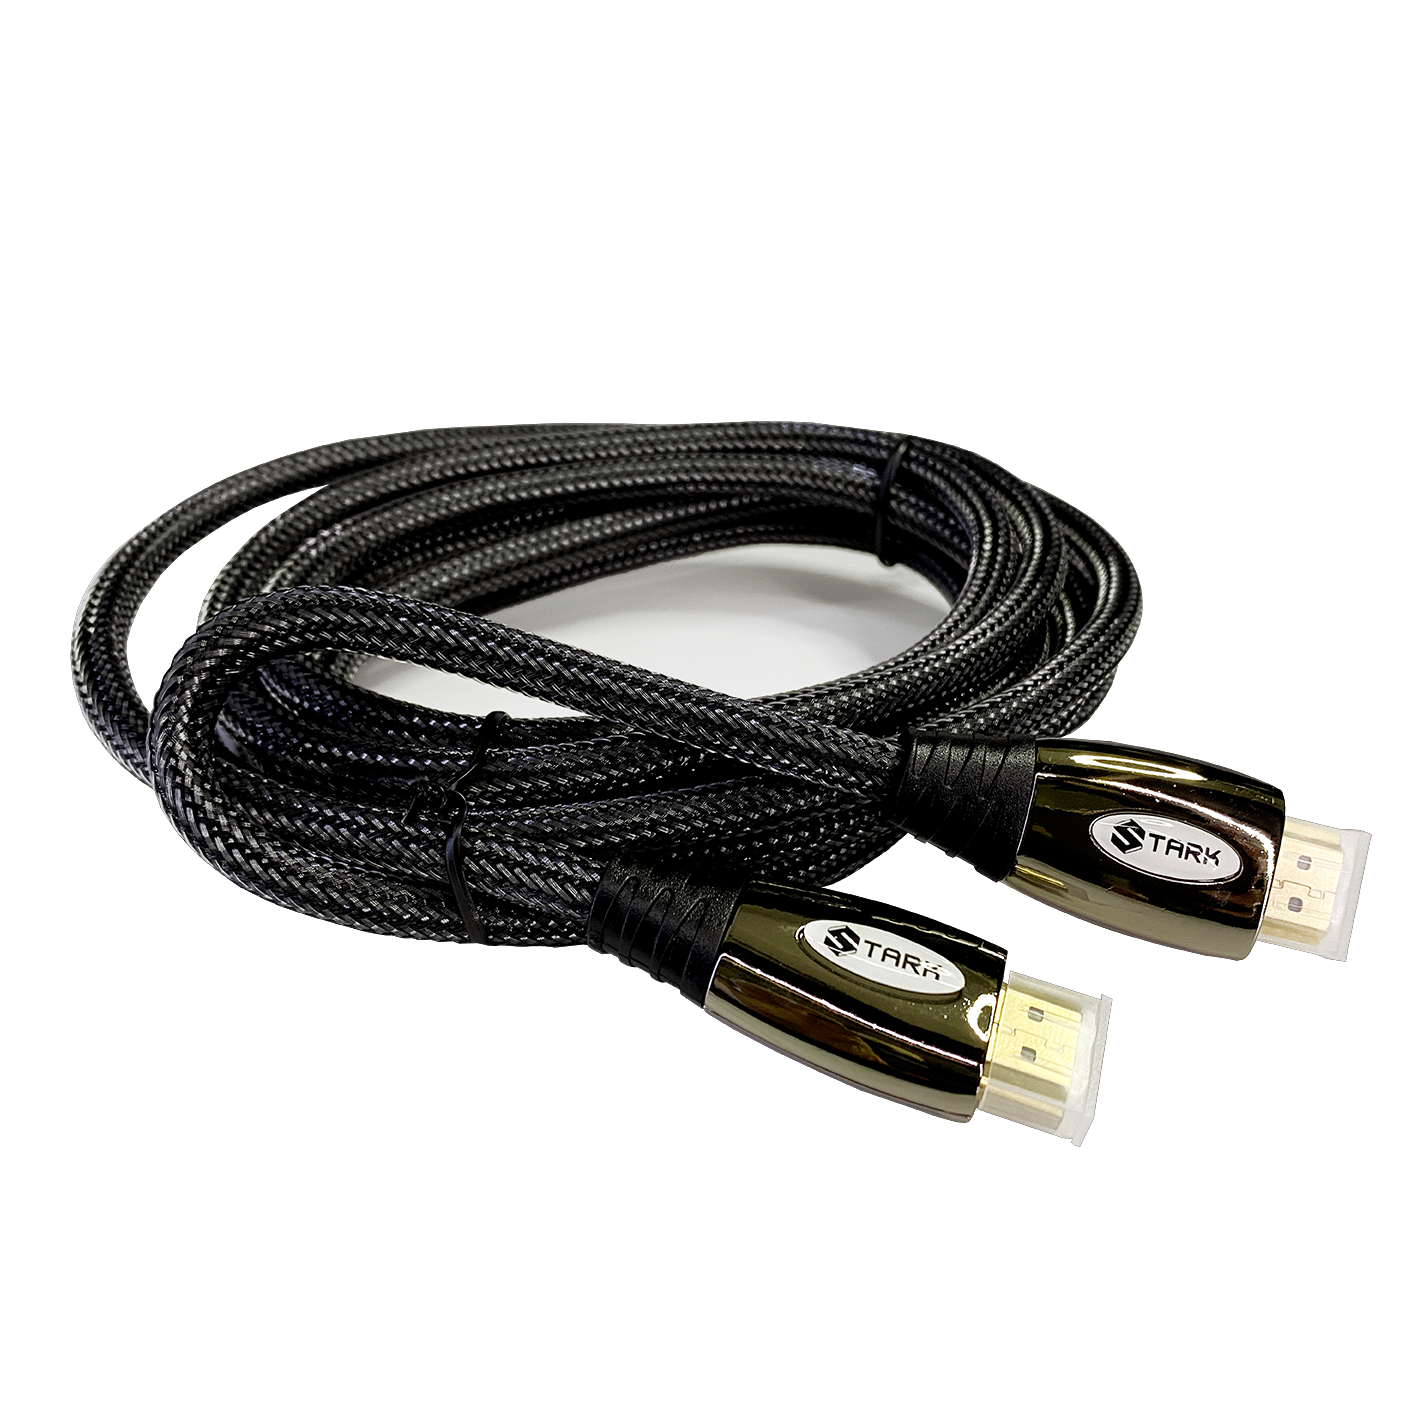 STARK kabl HDMI M-M, pozlaćen 4K(Ultra HD), metalno kućište, podržava 3D, 3m (Slika 2)